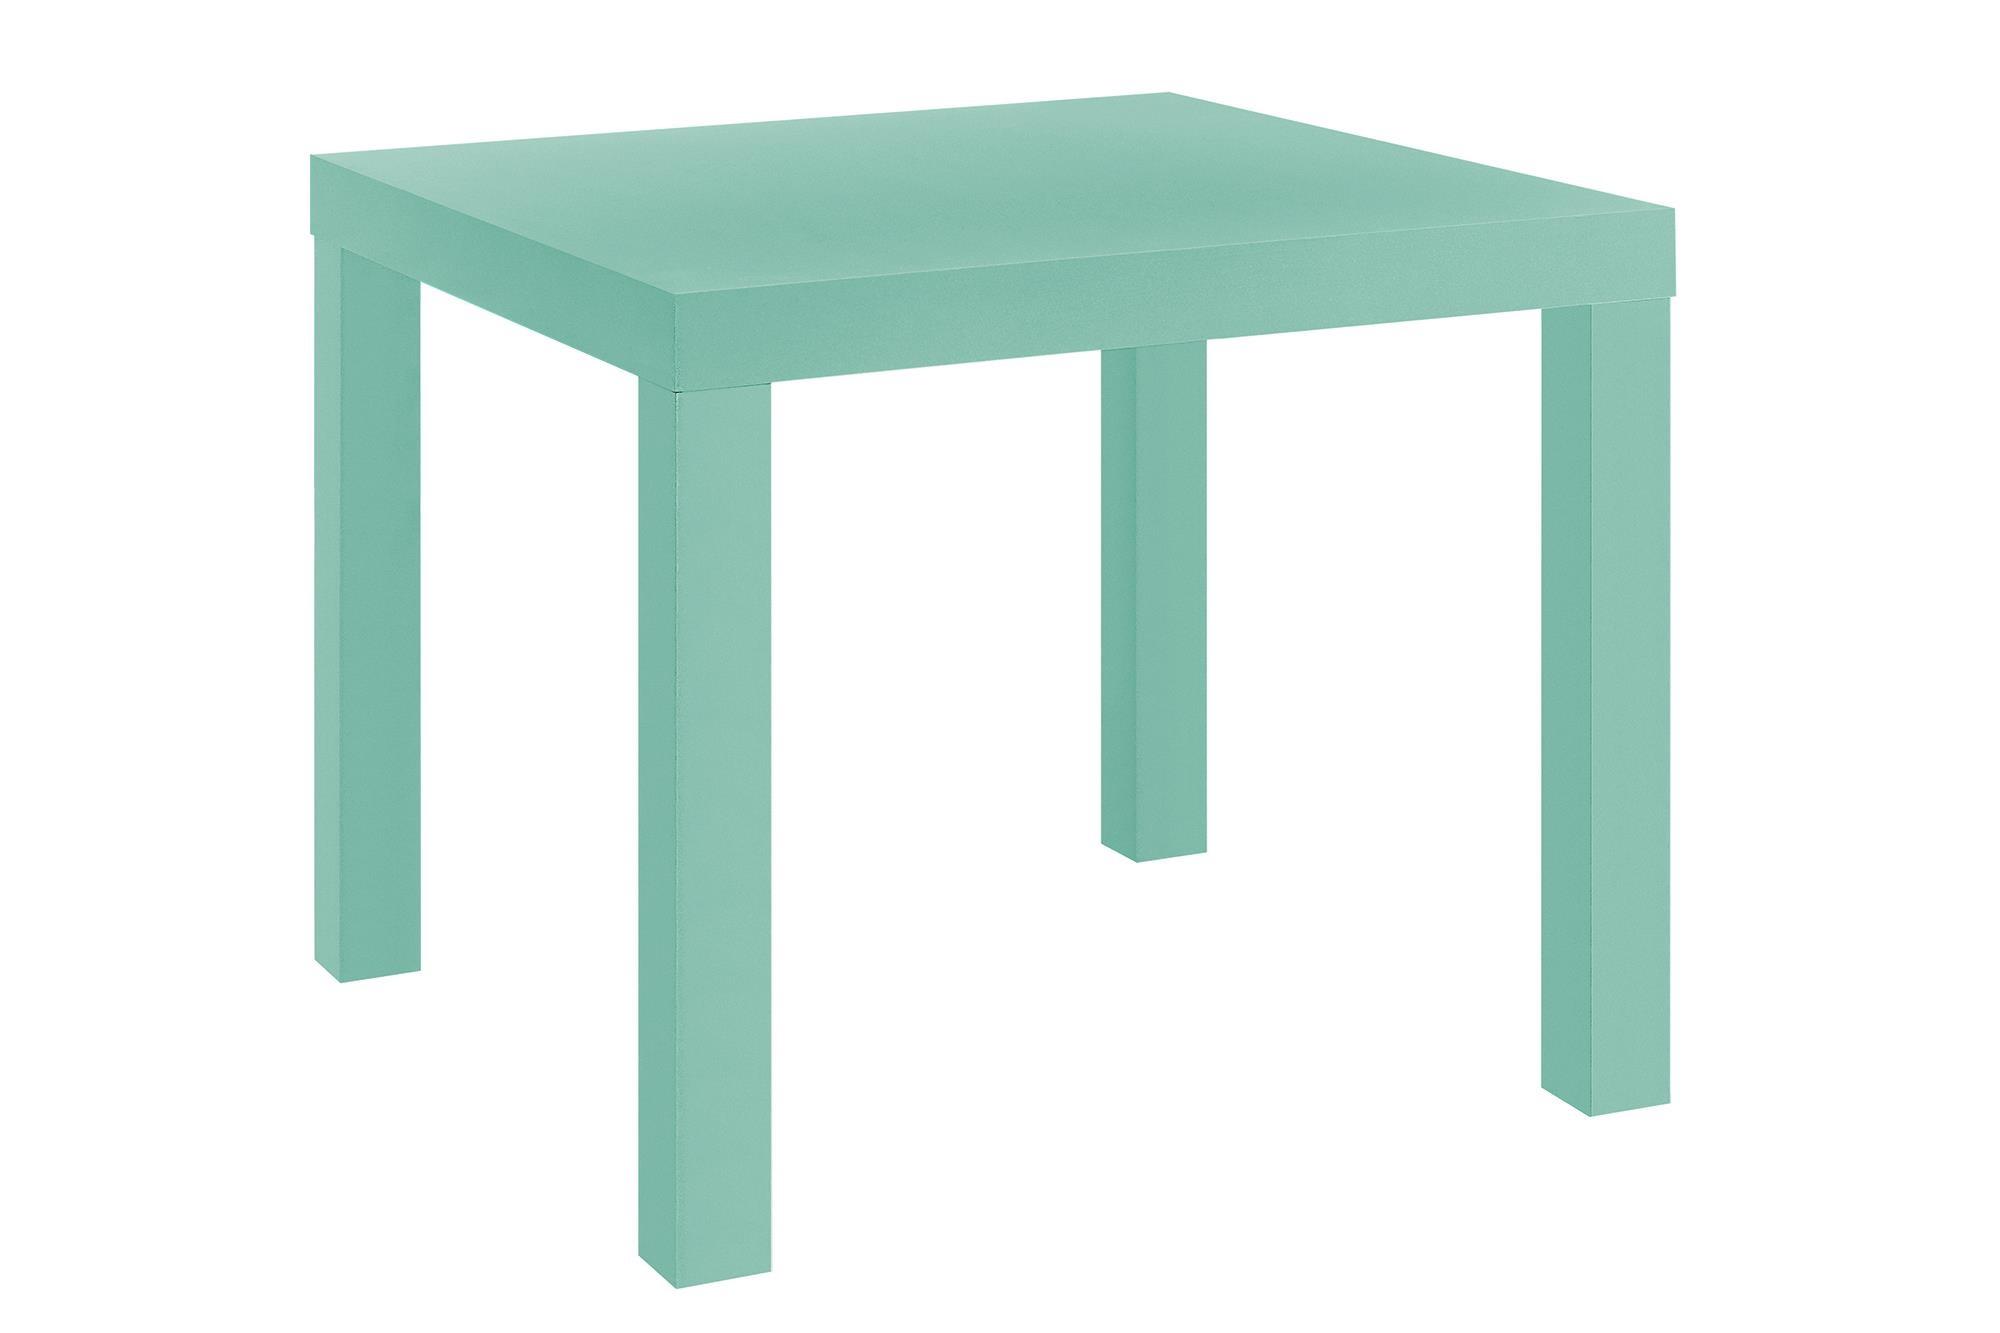 mainstays parsons end table multiple colors with drawer woodworking vise plans light mirror corner dining set shoe furniture big lots wicker vintage ethan allen dresser argos